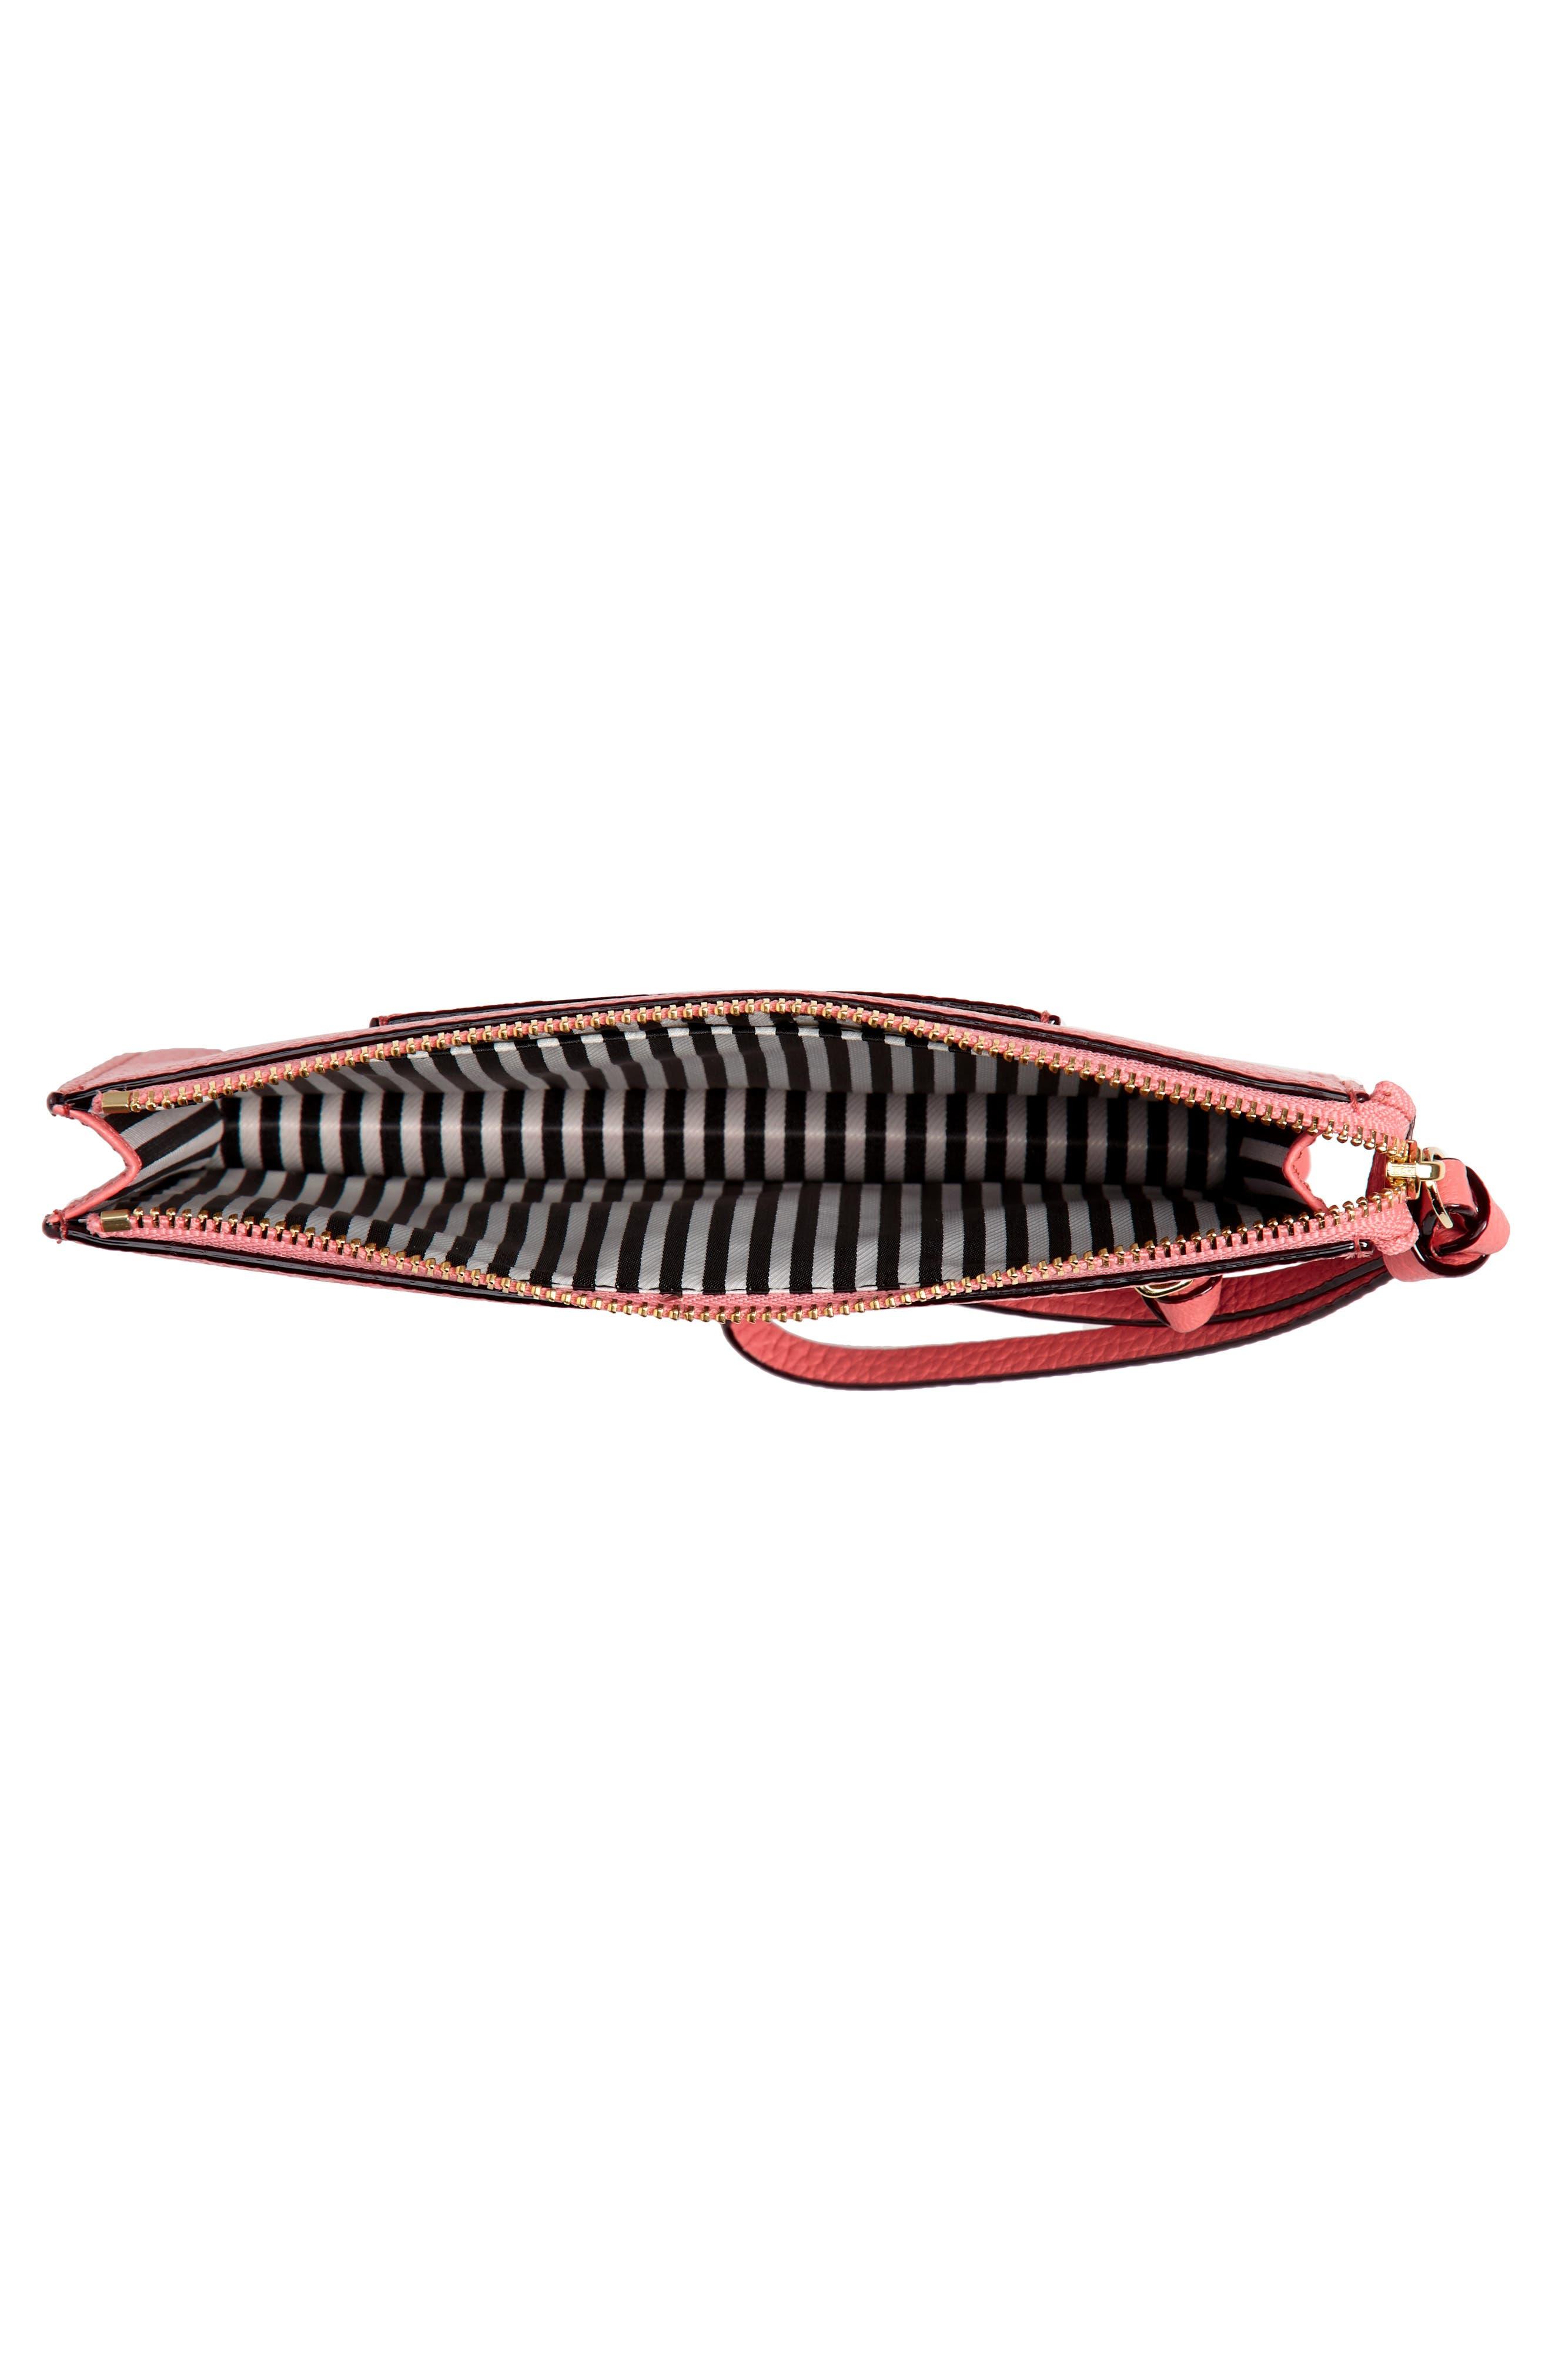 jackson street - lancey leather wristlet,                             Alternate thumbnail 4, color,                             Coral Pebble